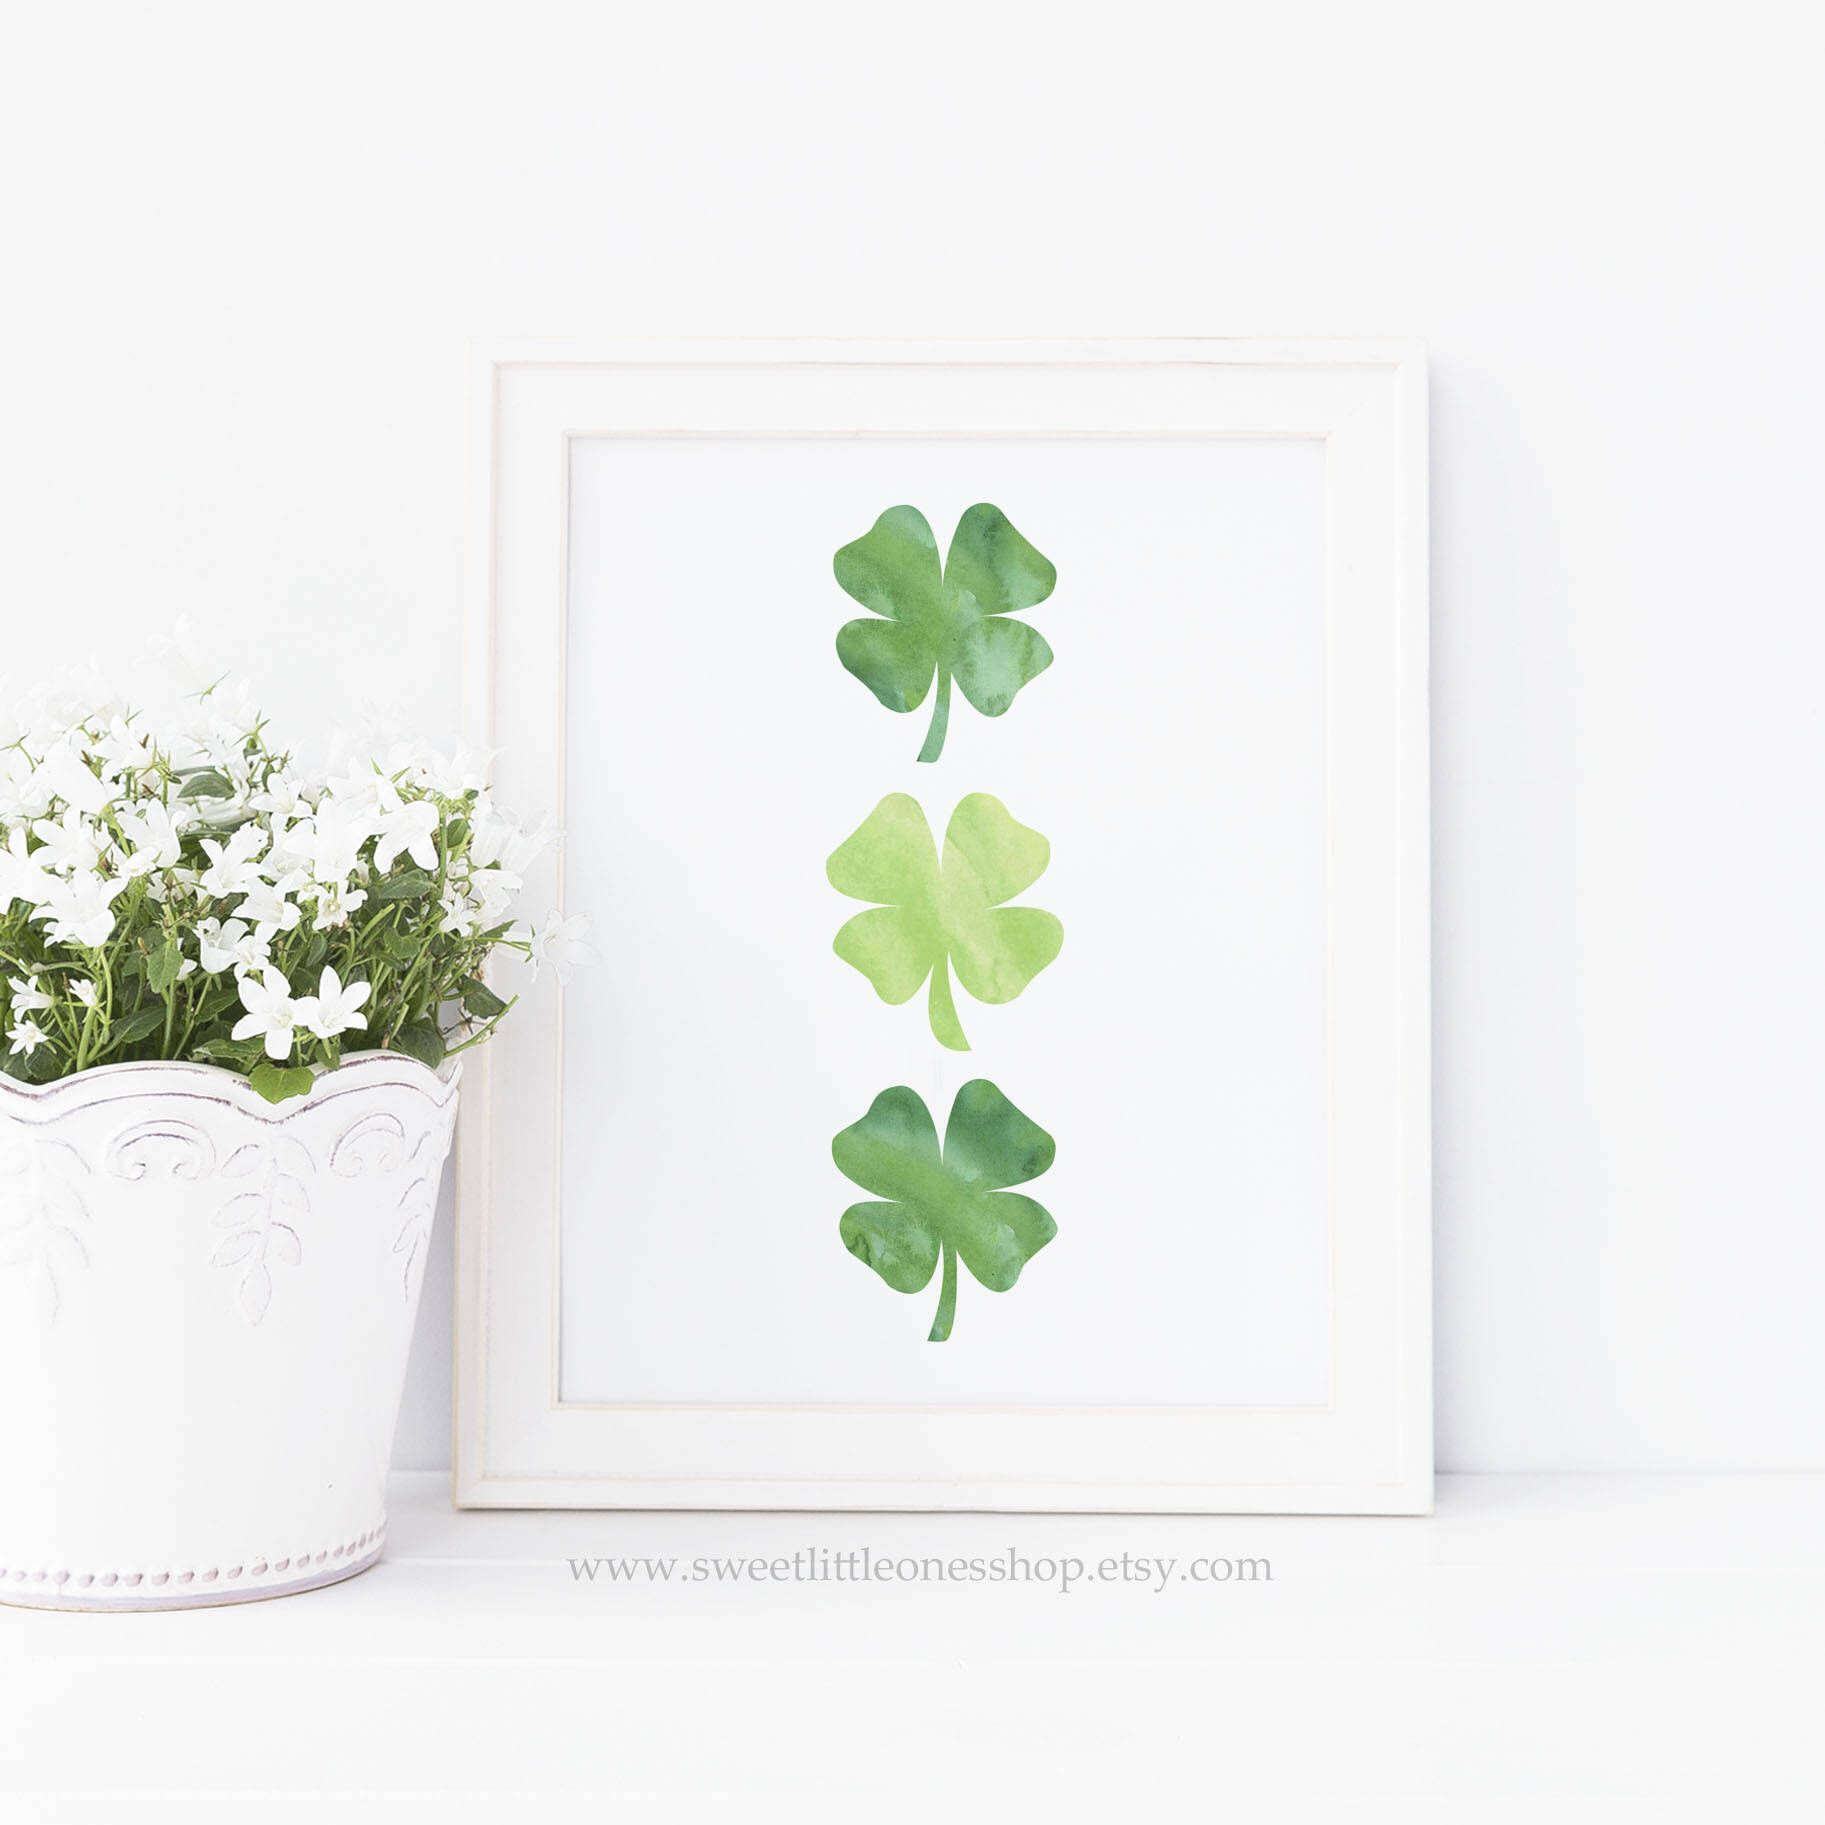 Three Four Leaf Clovers St Patrick's Day Printable Wall Art Green Shamrocks  Print St Patricks Day